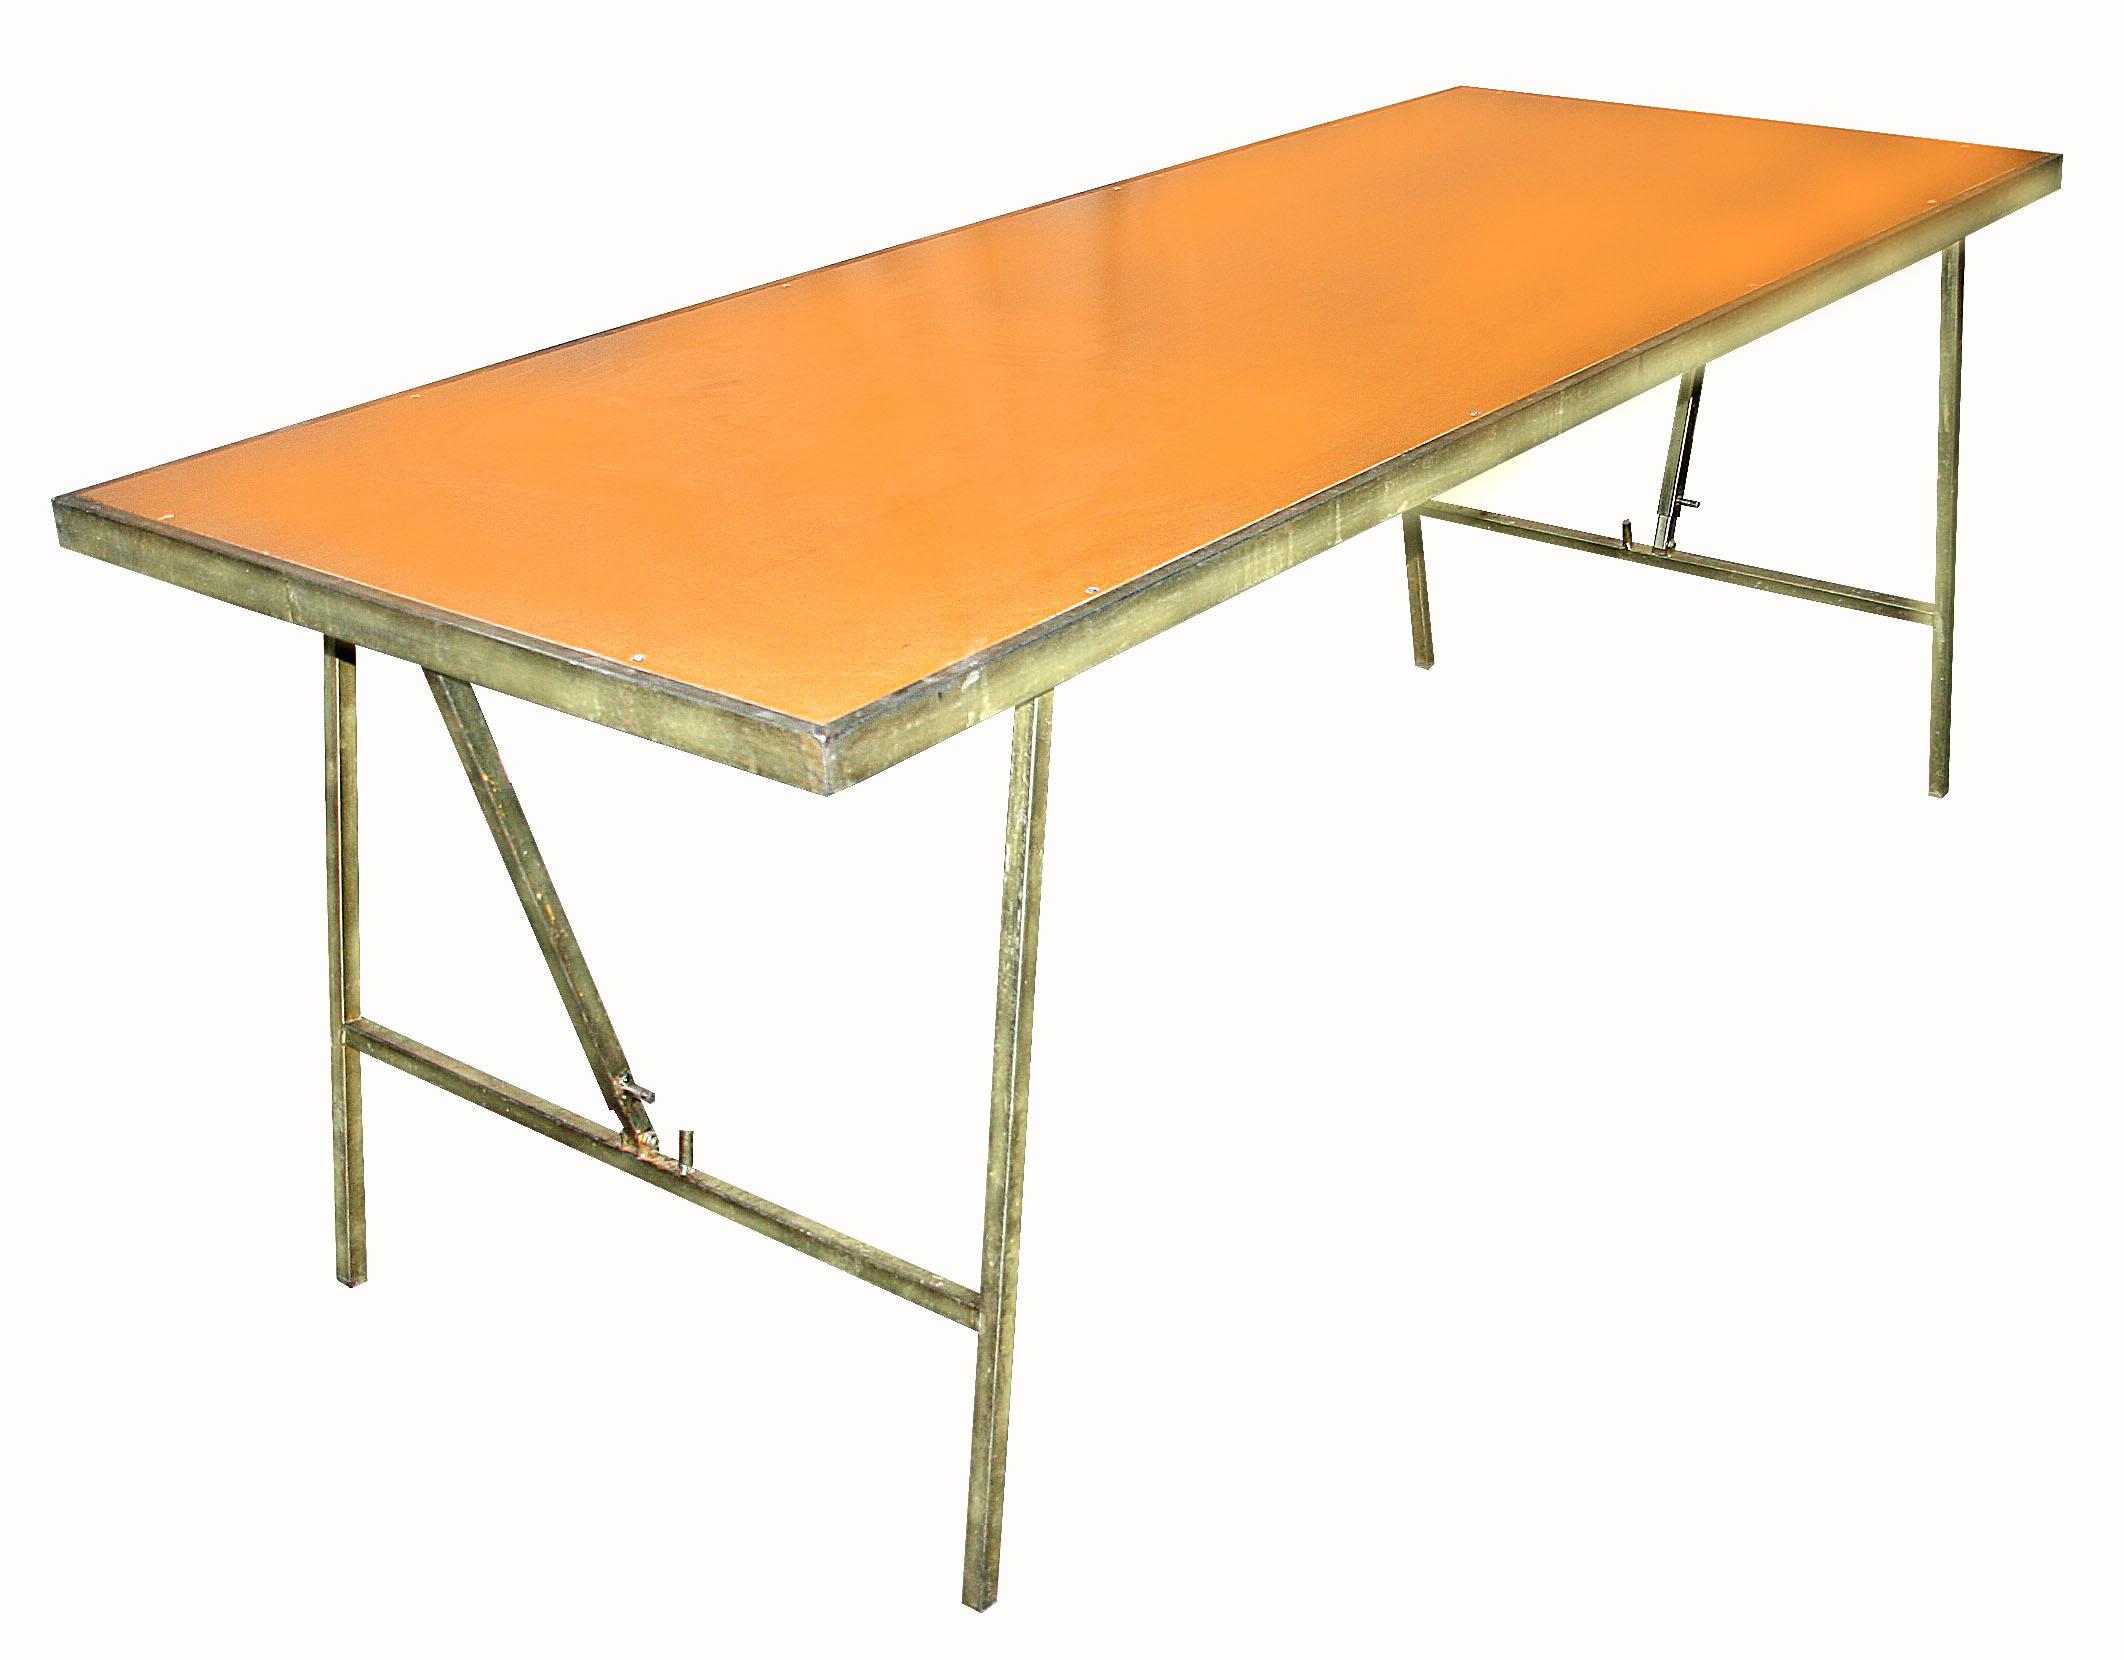 Alquiler de mesa sobre de madera patas de hierro for Patas de mesa plegables